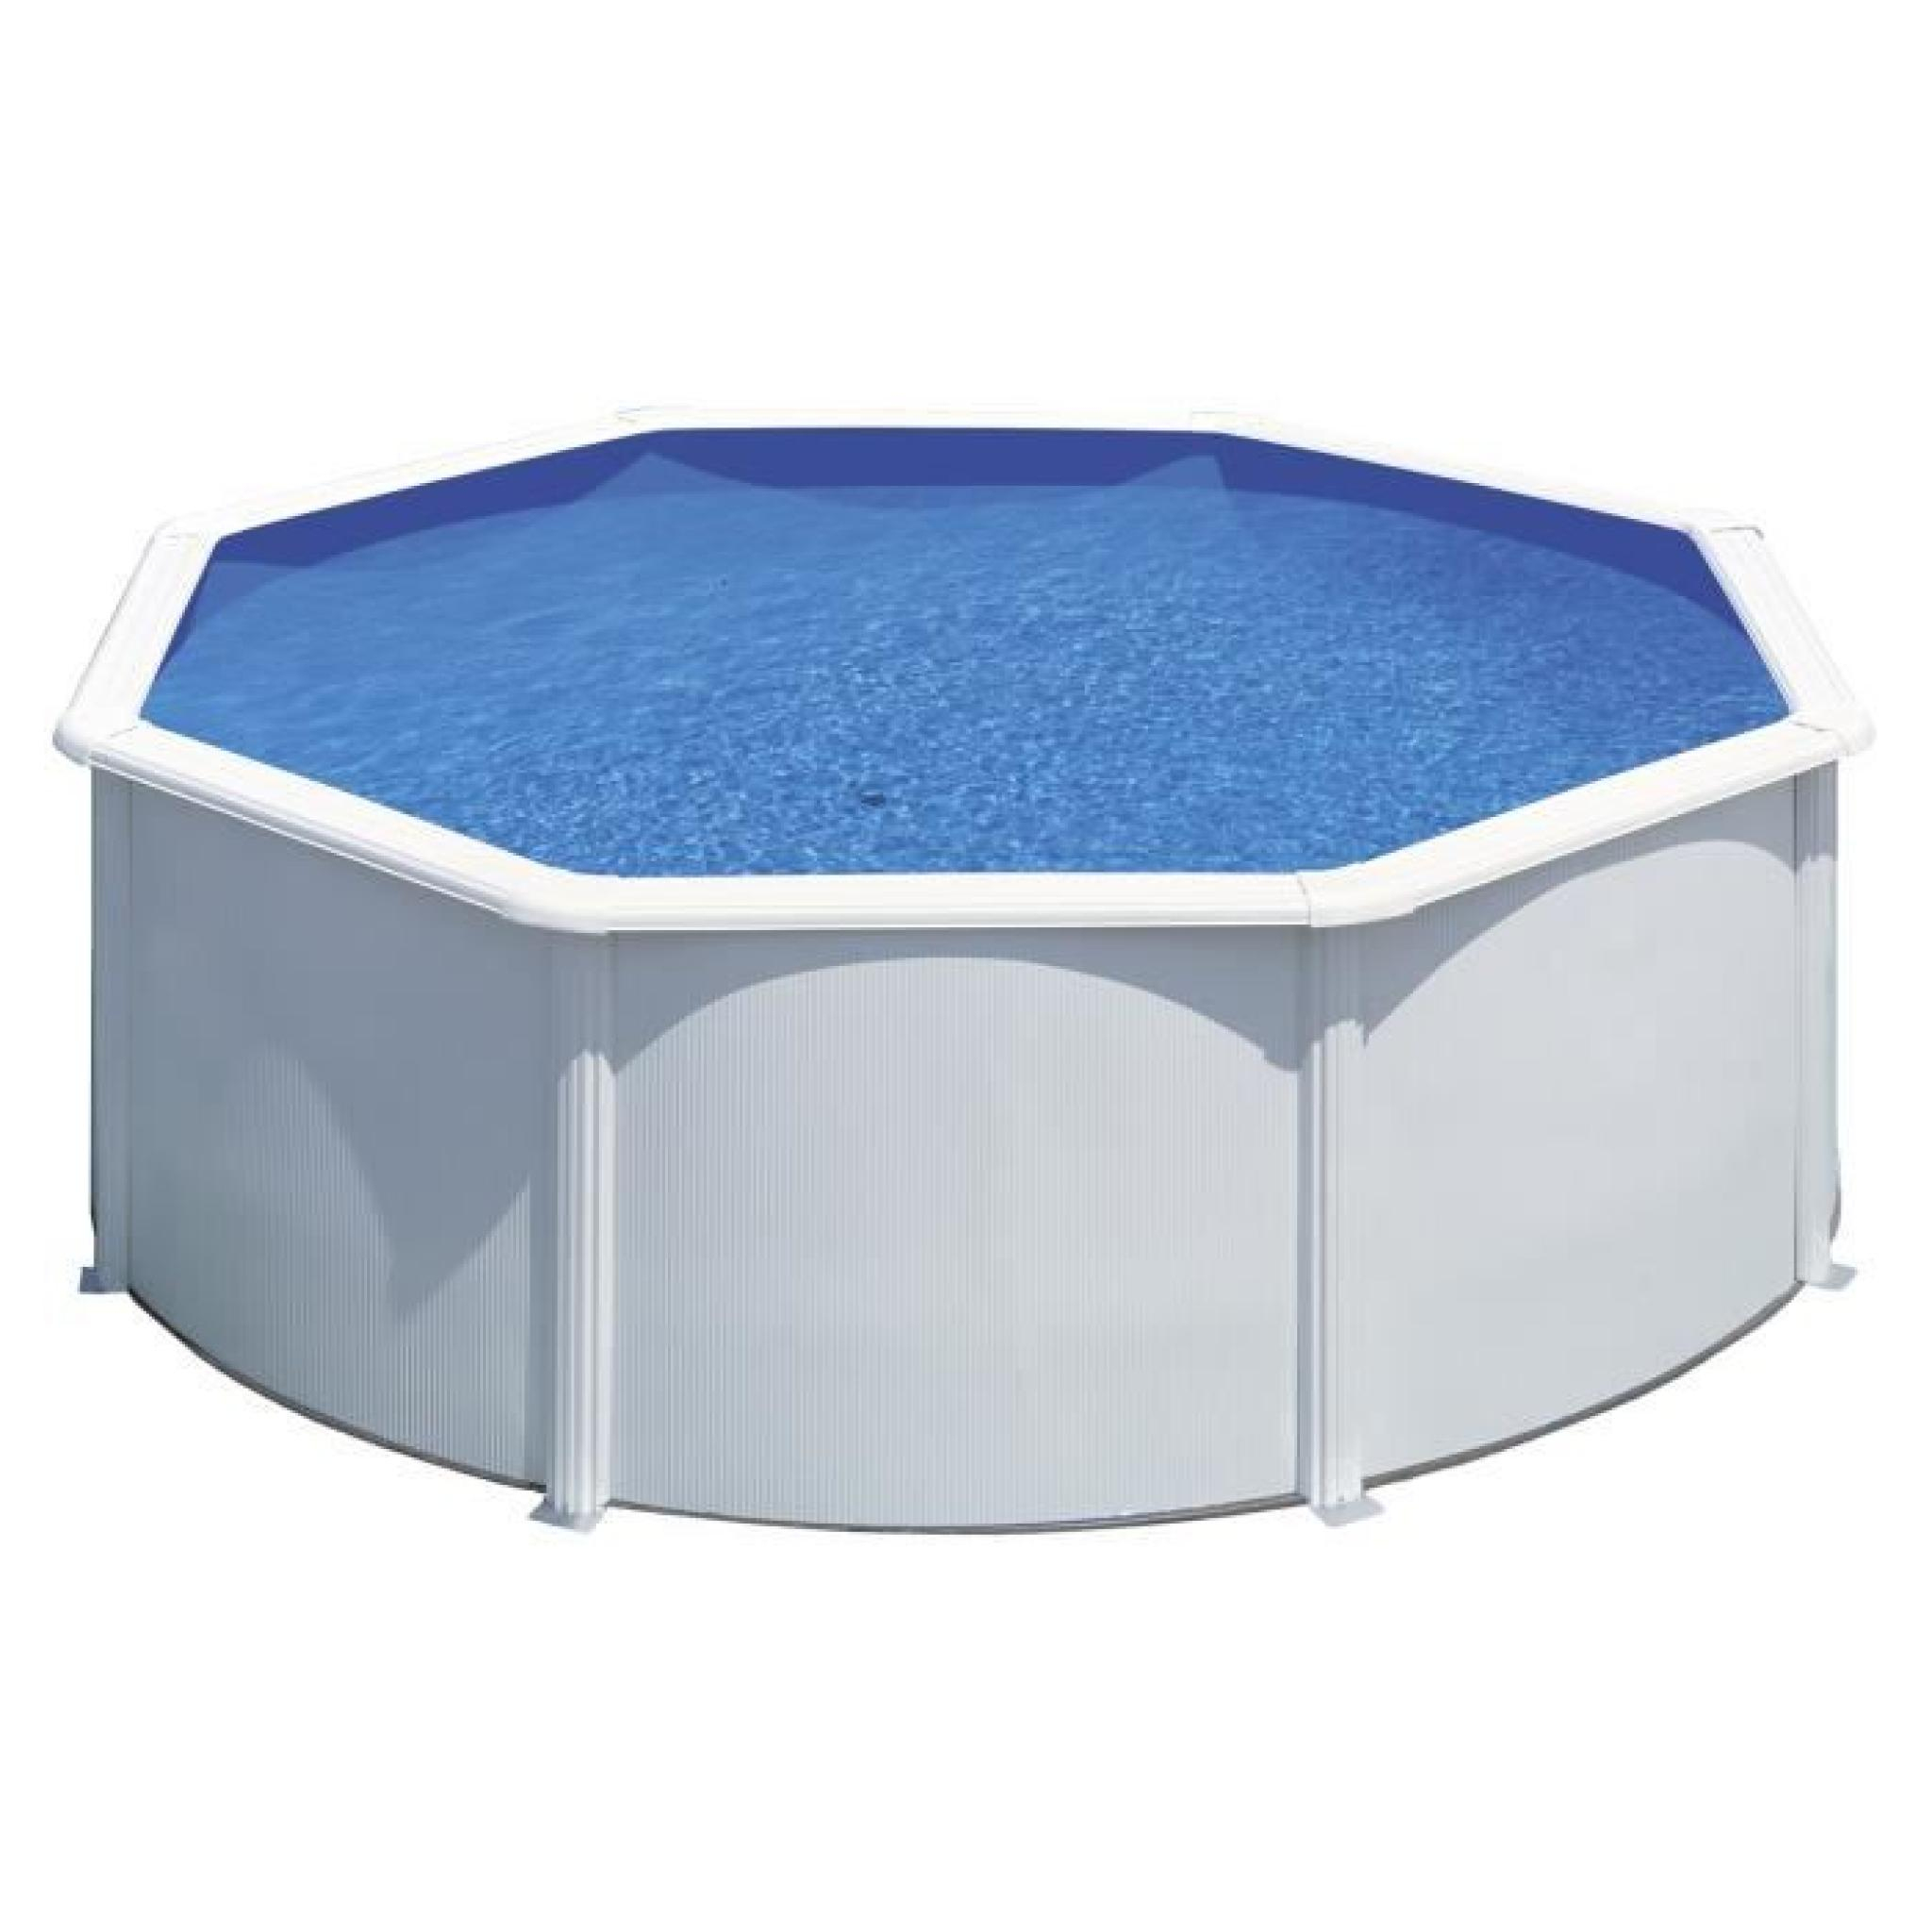 Gre Kit Piscine Hors-Sol Ronde En Acier Wet Ø3,50X1,20 M - Liner Bleu serapportantà Piscine Hors Sol Gre